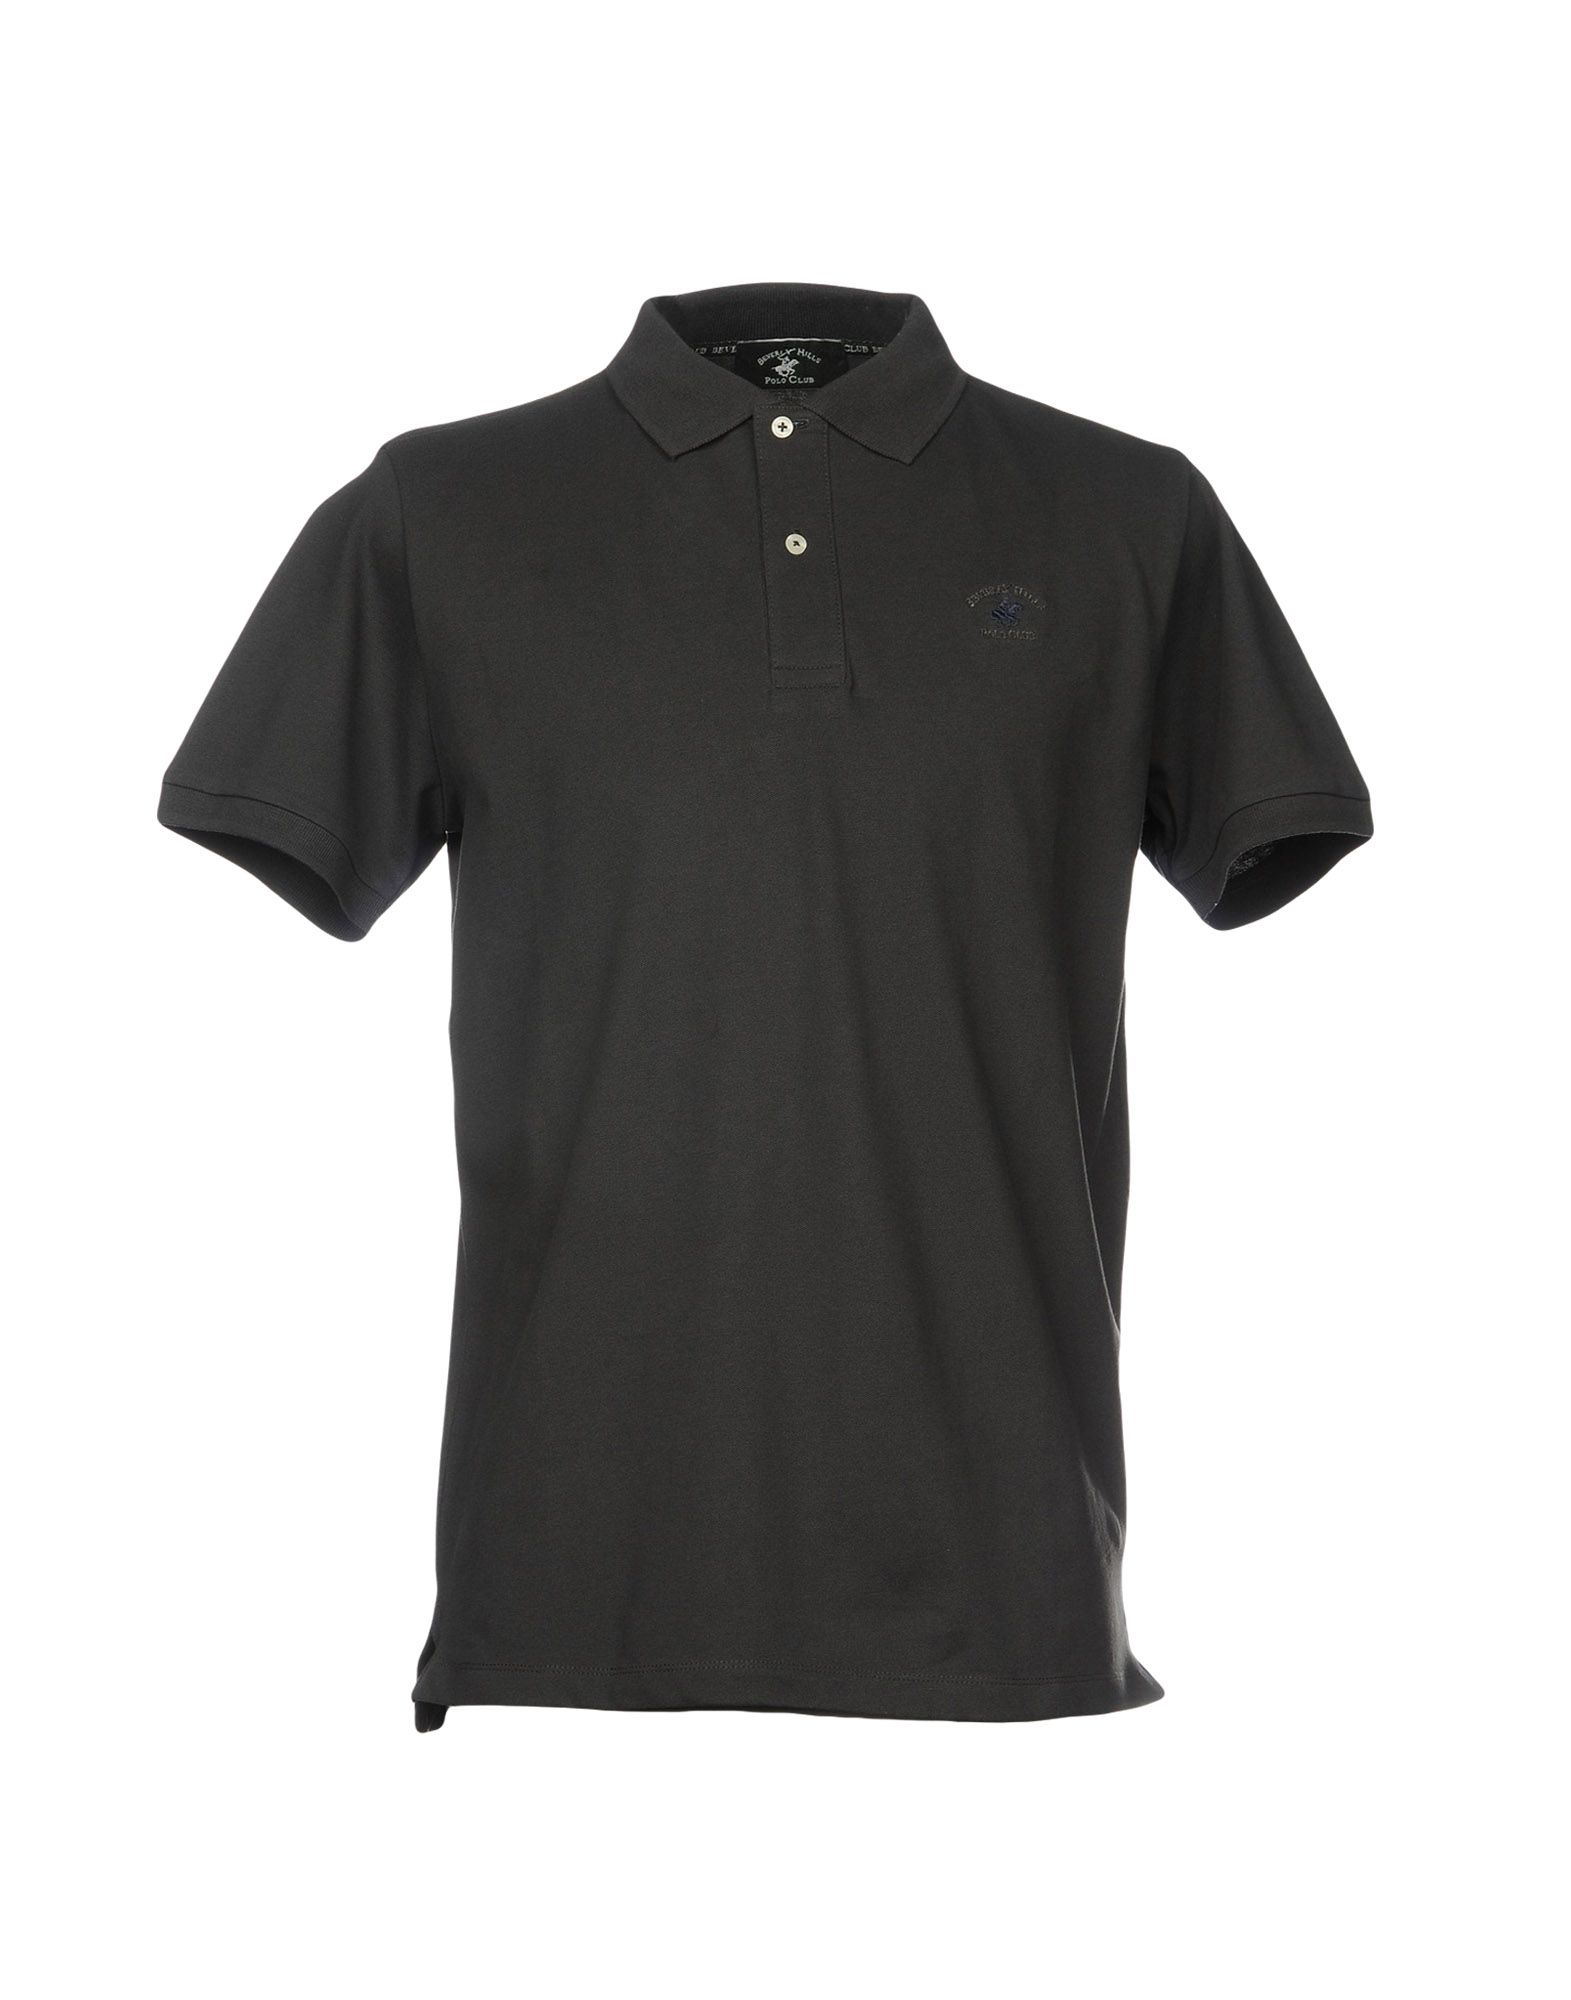 5d51ac328e2 Beverly Hills Polo Club Άνδρας Κολεξιόν Άνοιξη-Καλοκαίρι και ...